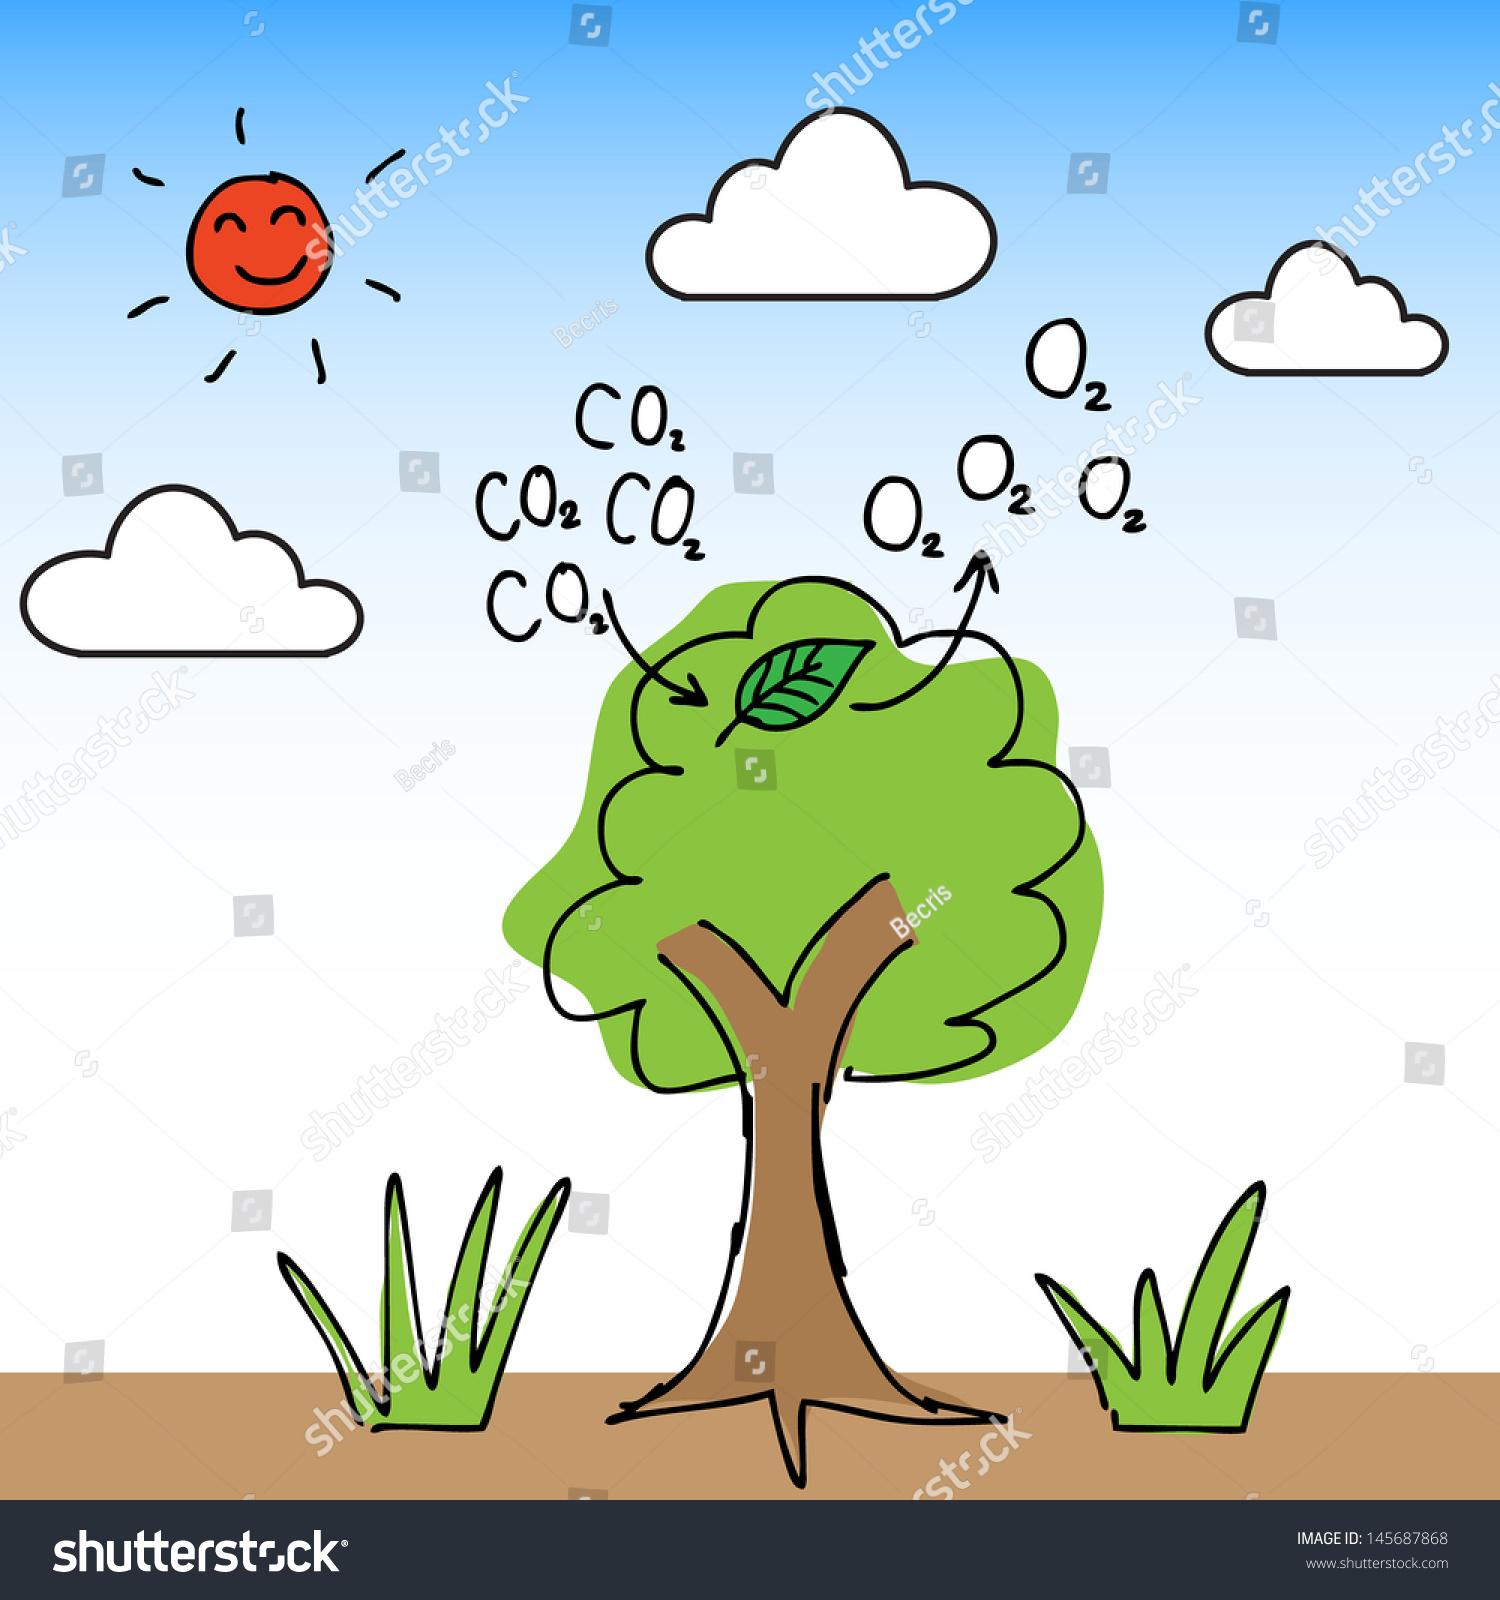 how to get carbon dioxide